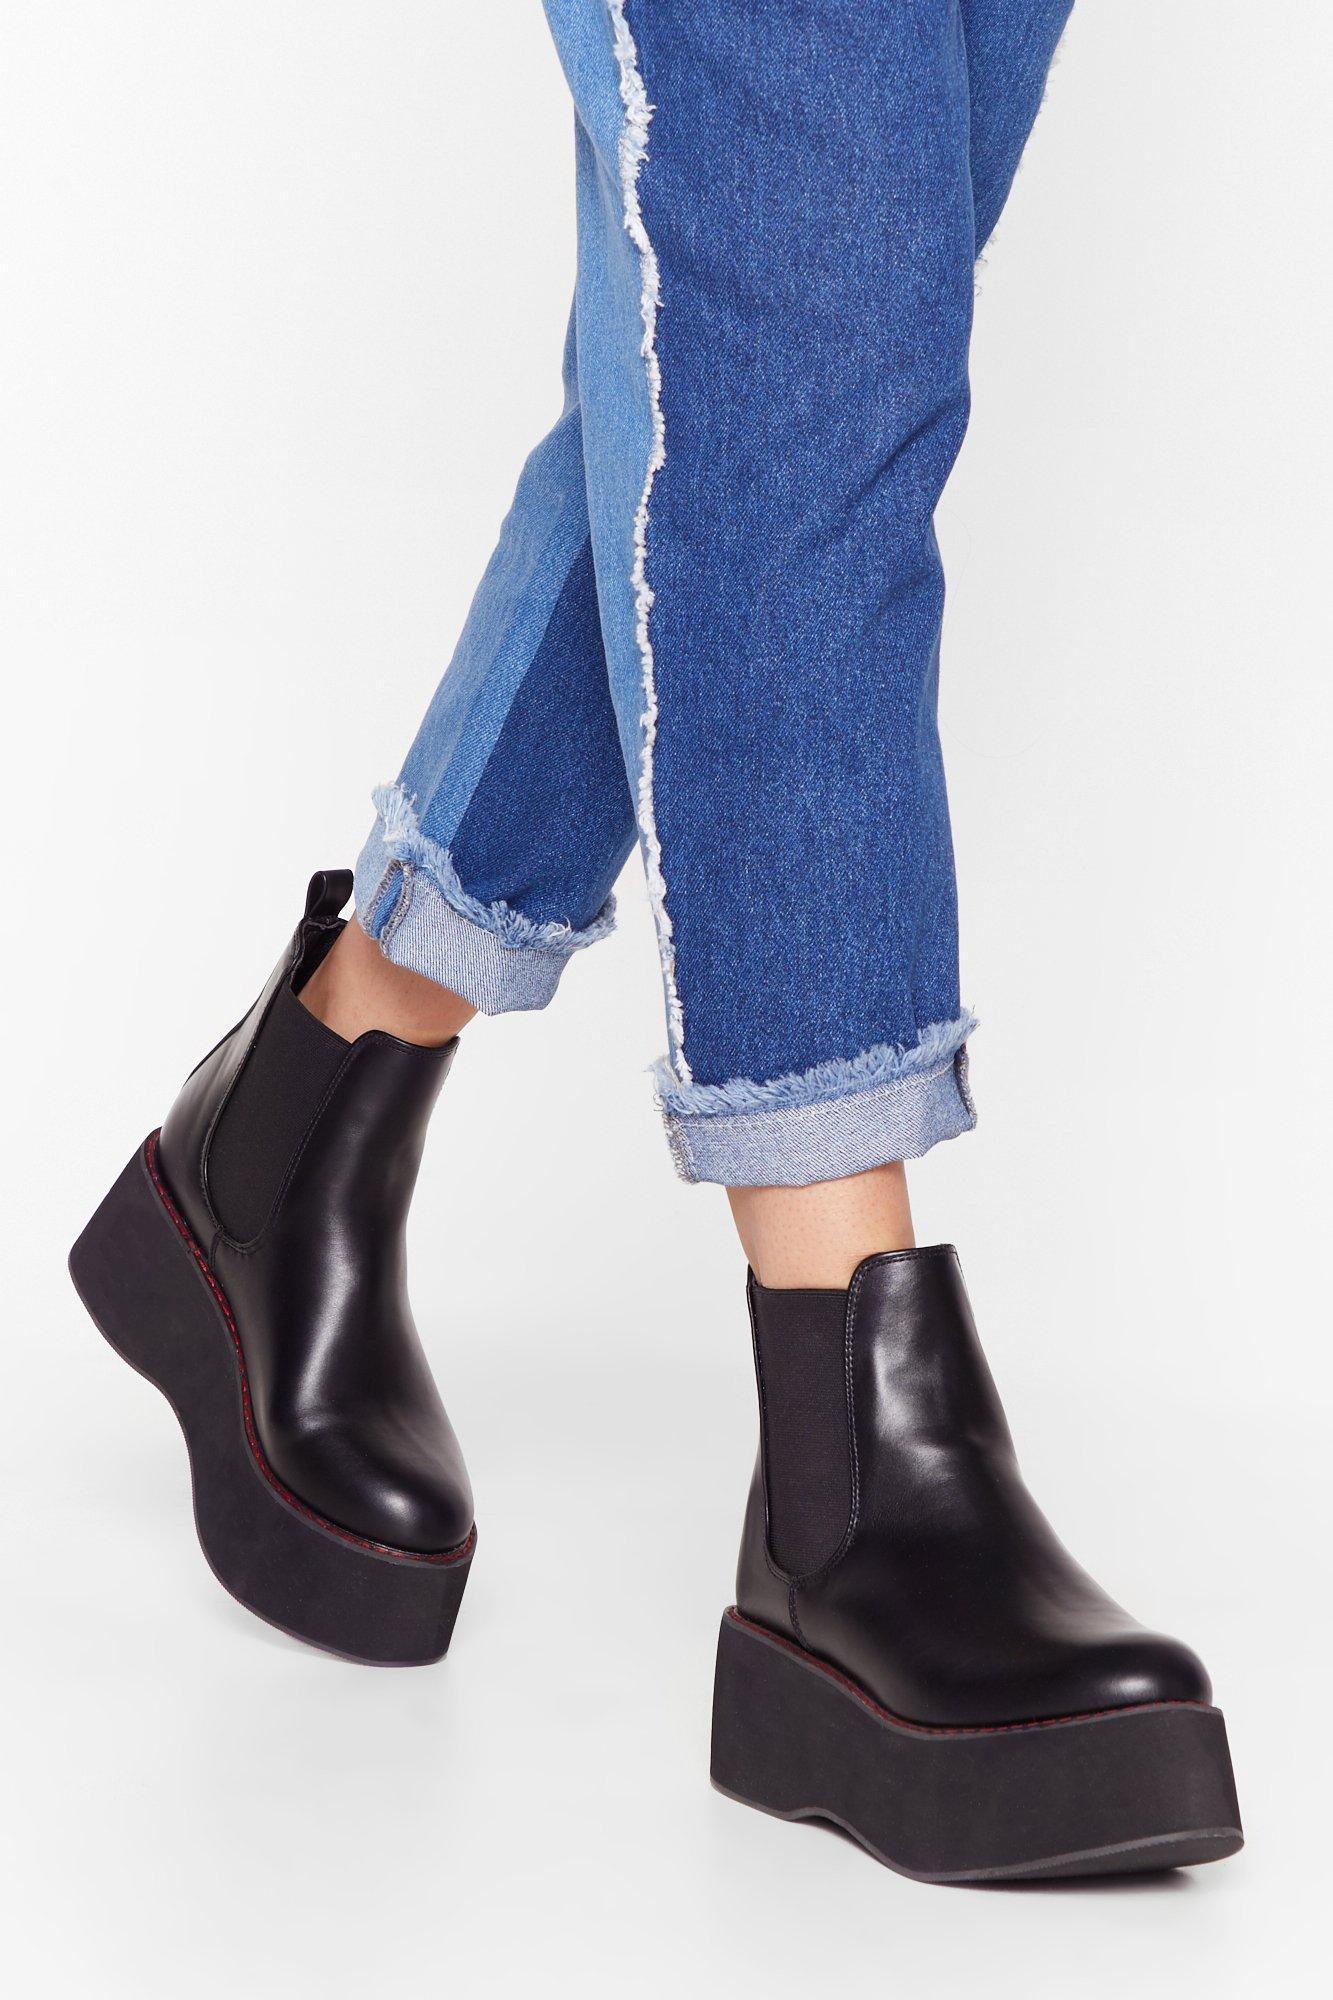 Image of Stitch 'Em Up Faux Leather Platform Boots